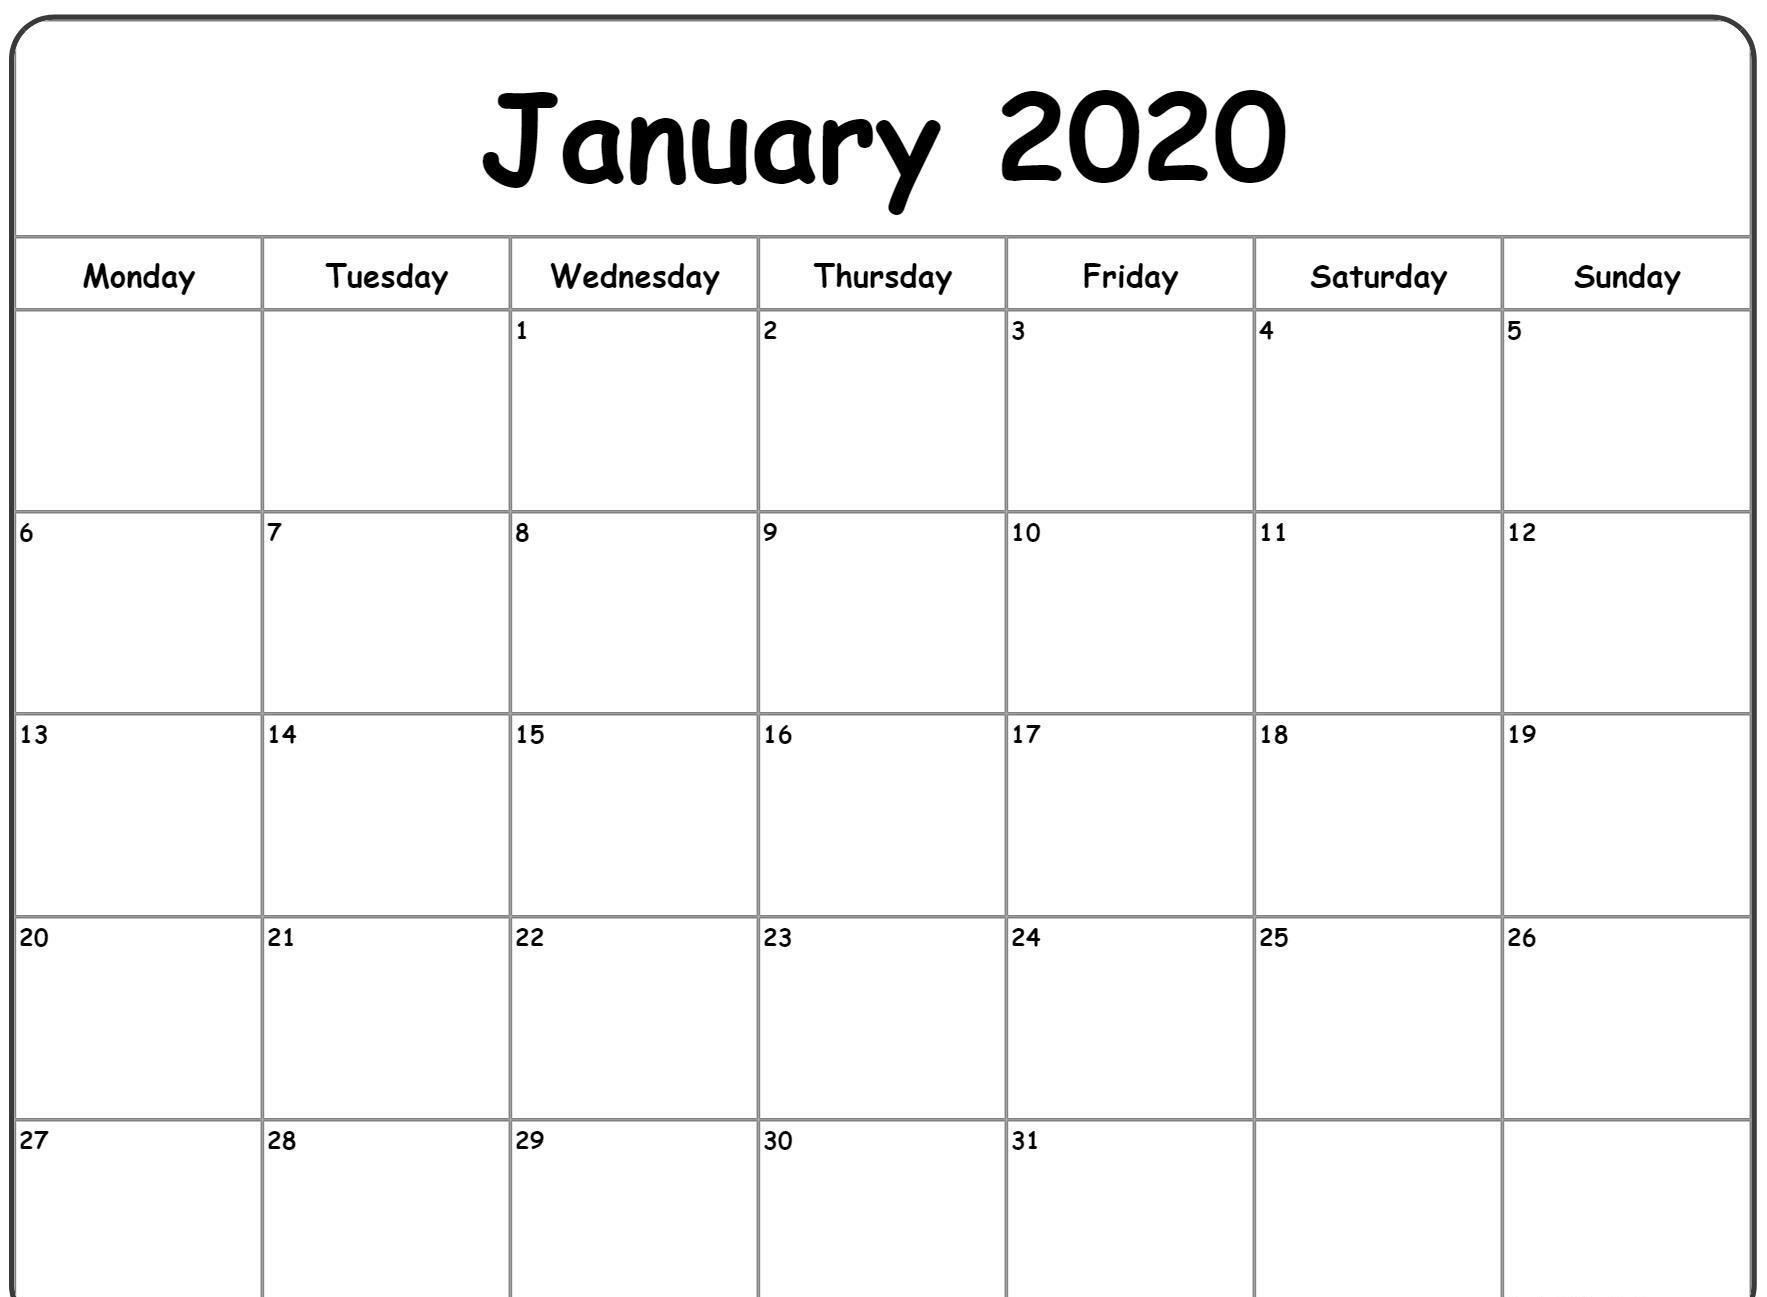 Free Blank January 2020 Calendar Printable Template With Notes pertaining to Jan 2020 Calendar